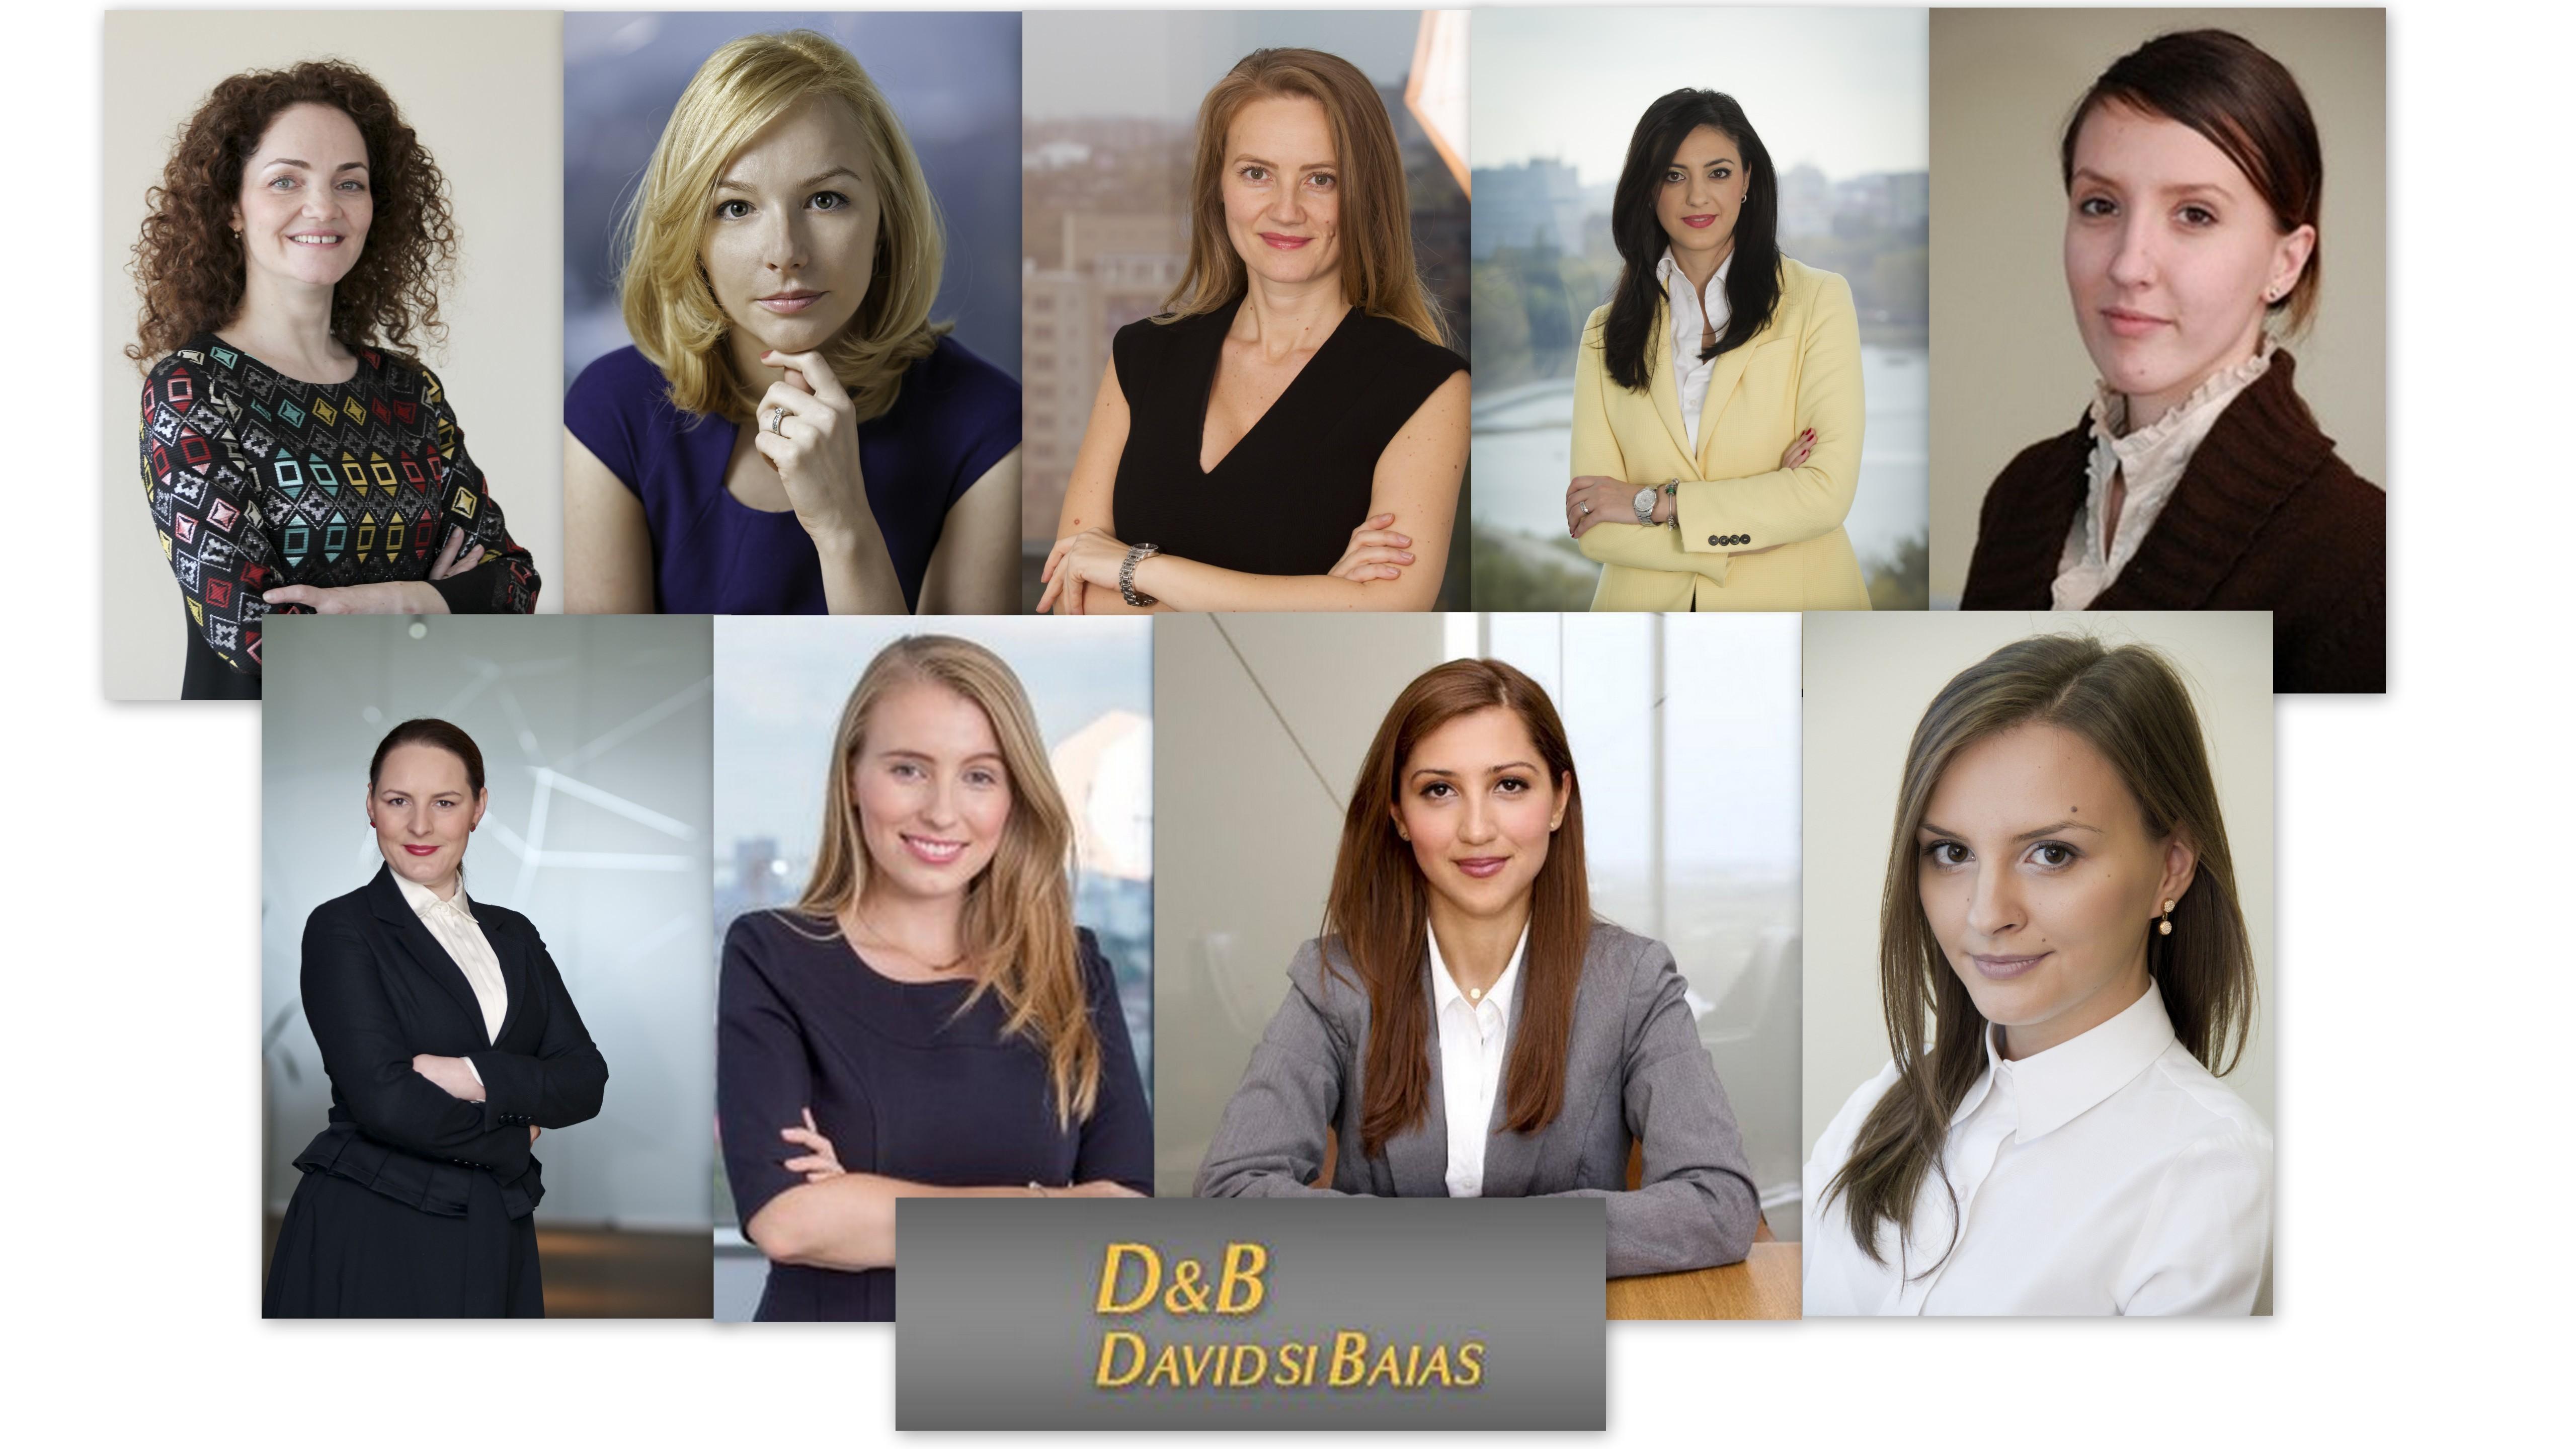 femeie cu avocat)